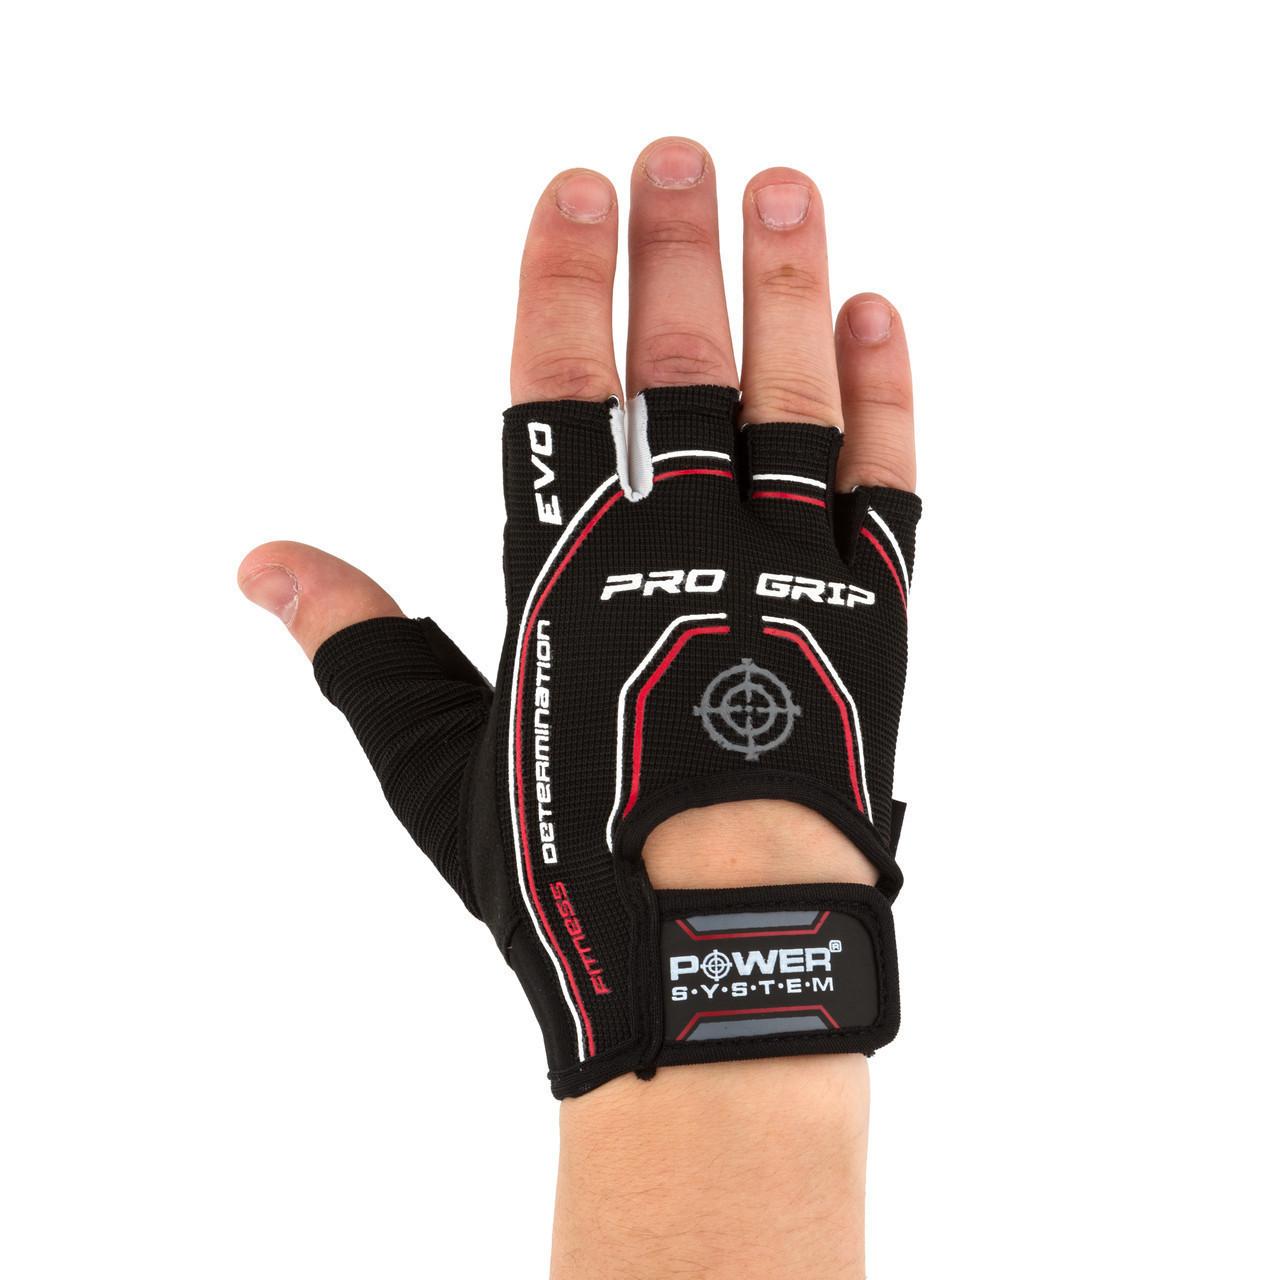 Перчатки для фитнеса и тяжелой атлетики Power System Pro Grip EVO PS-2250E L Black